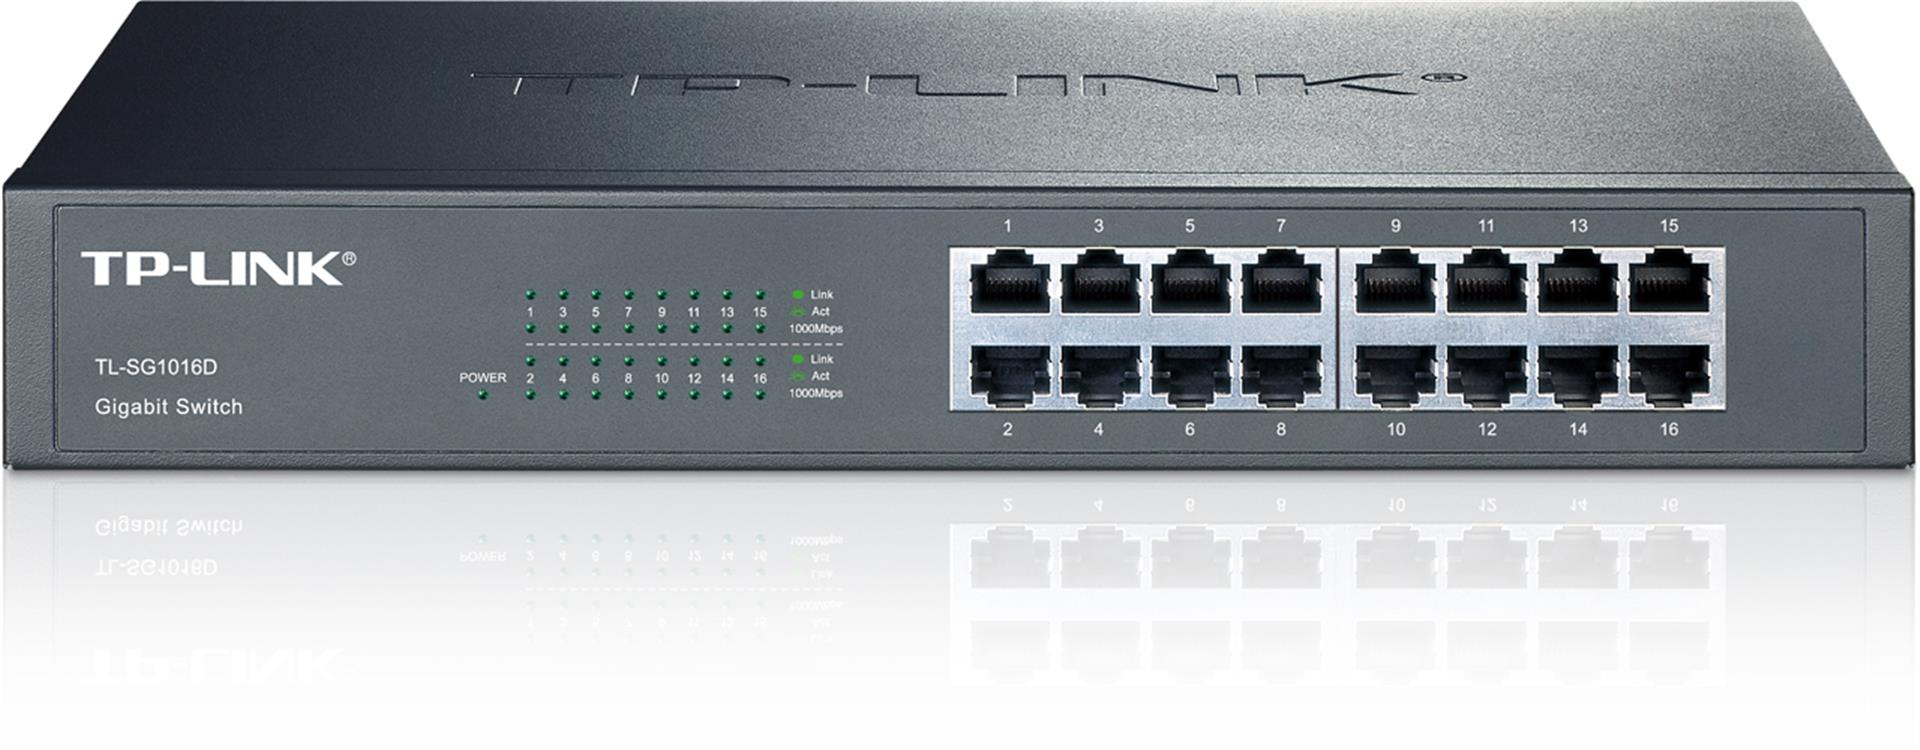 TP-Link TL-SG1016D 16x Gigabit Switch